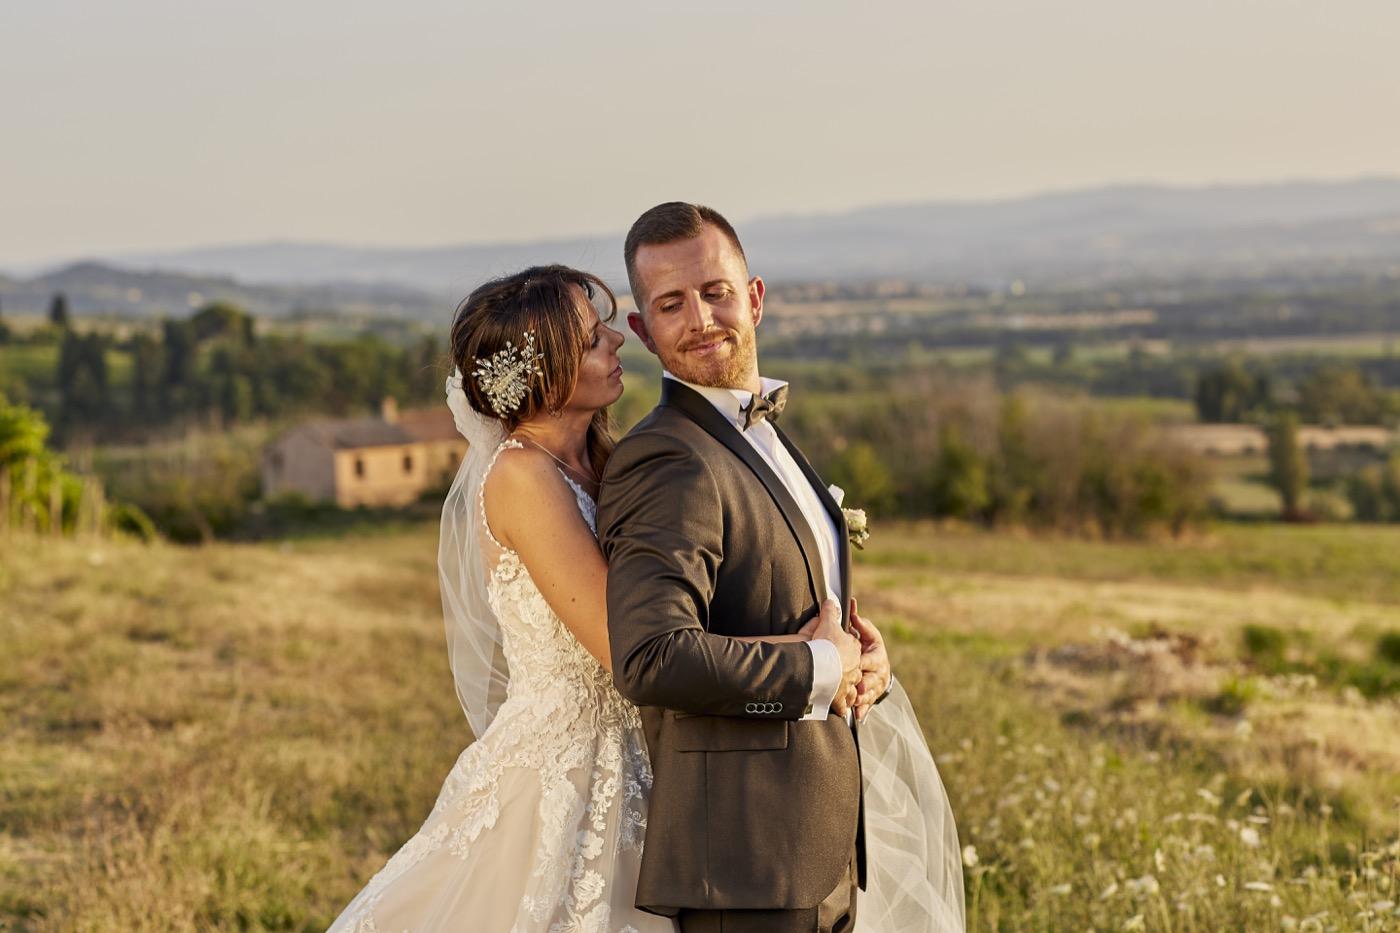 Claudio-Coppola-wedding-photographer-la-scuderia-eventi-preparativi-la-rosetta-perugia-72